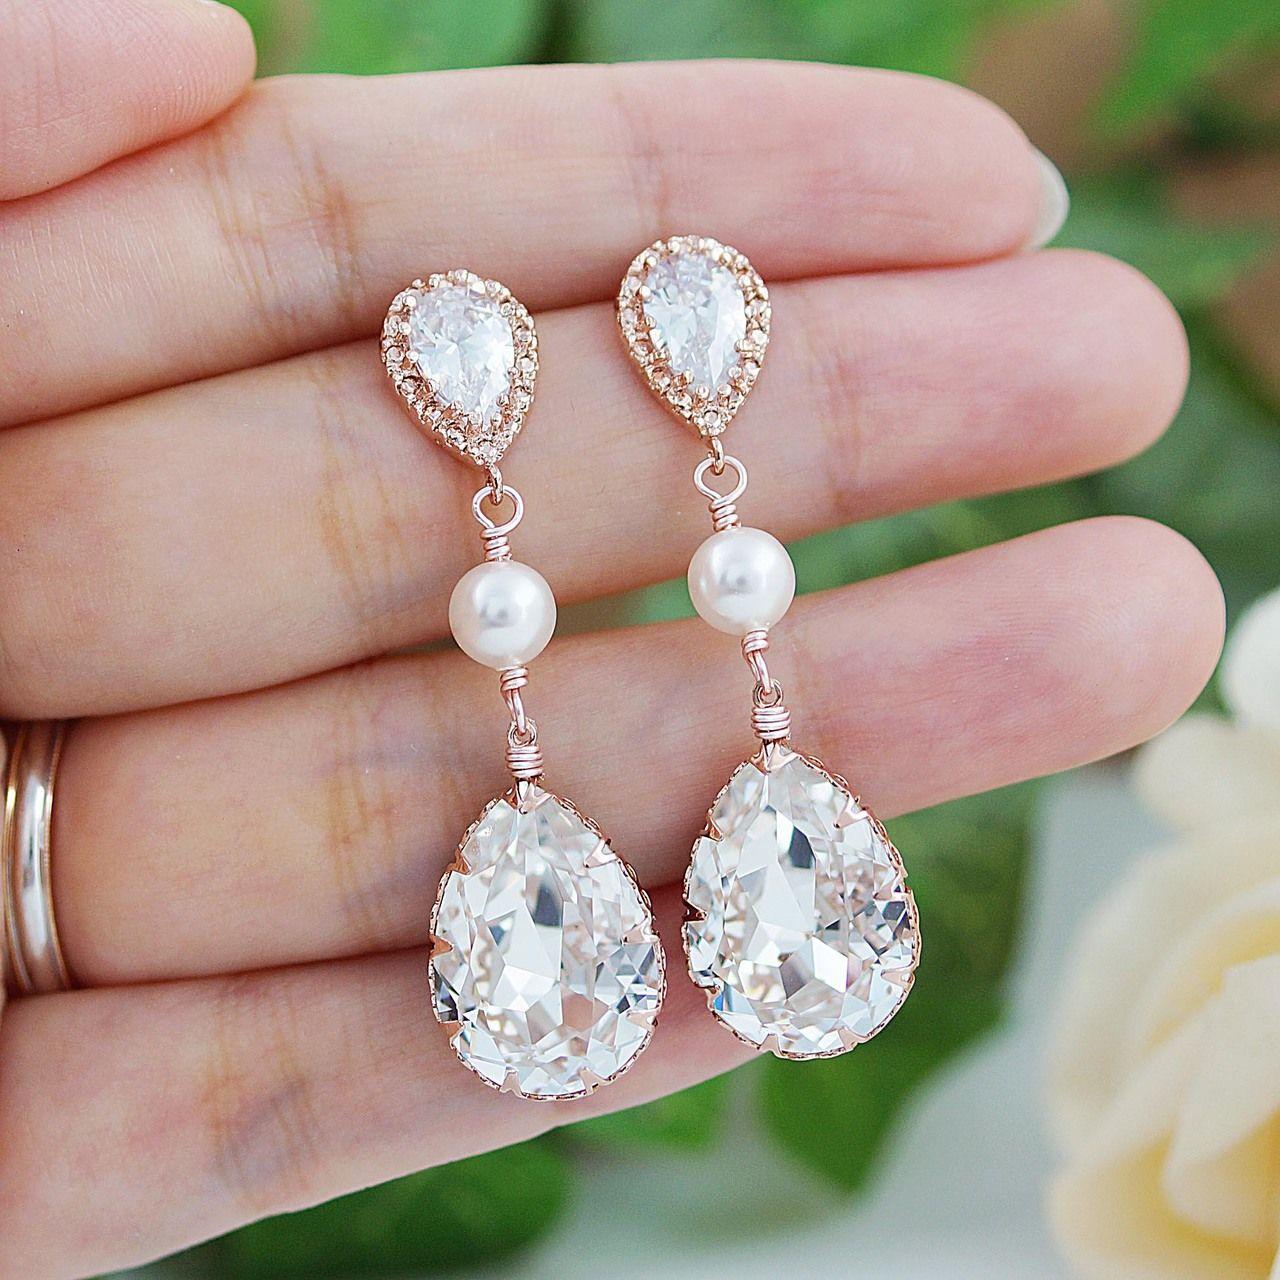 Swarovski Crystals with Swarovski Pearls Rose Gold Bridal Earrings ...